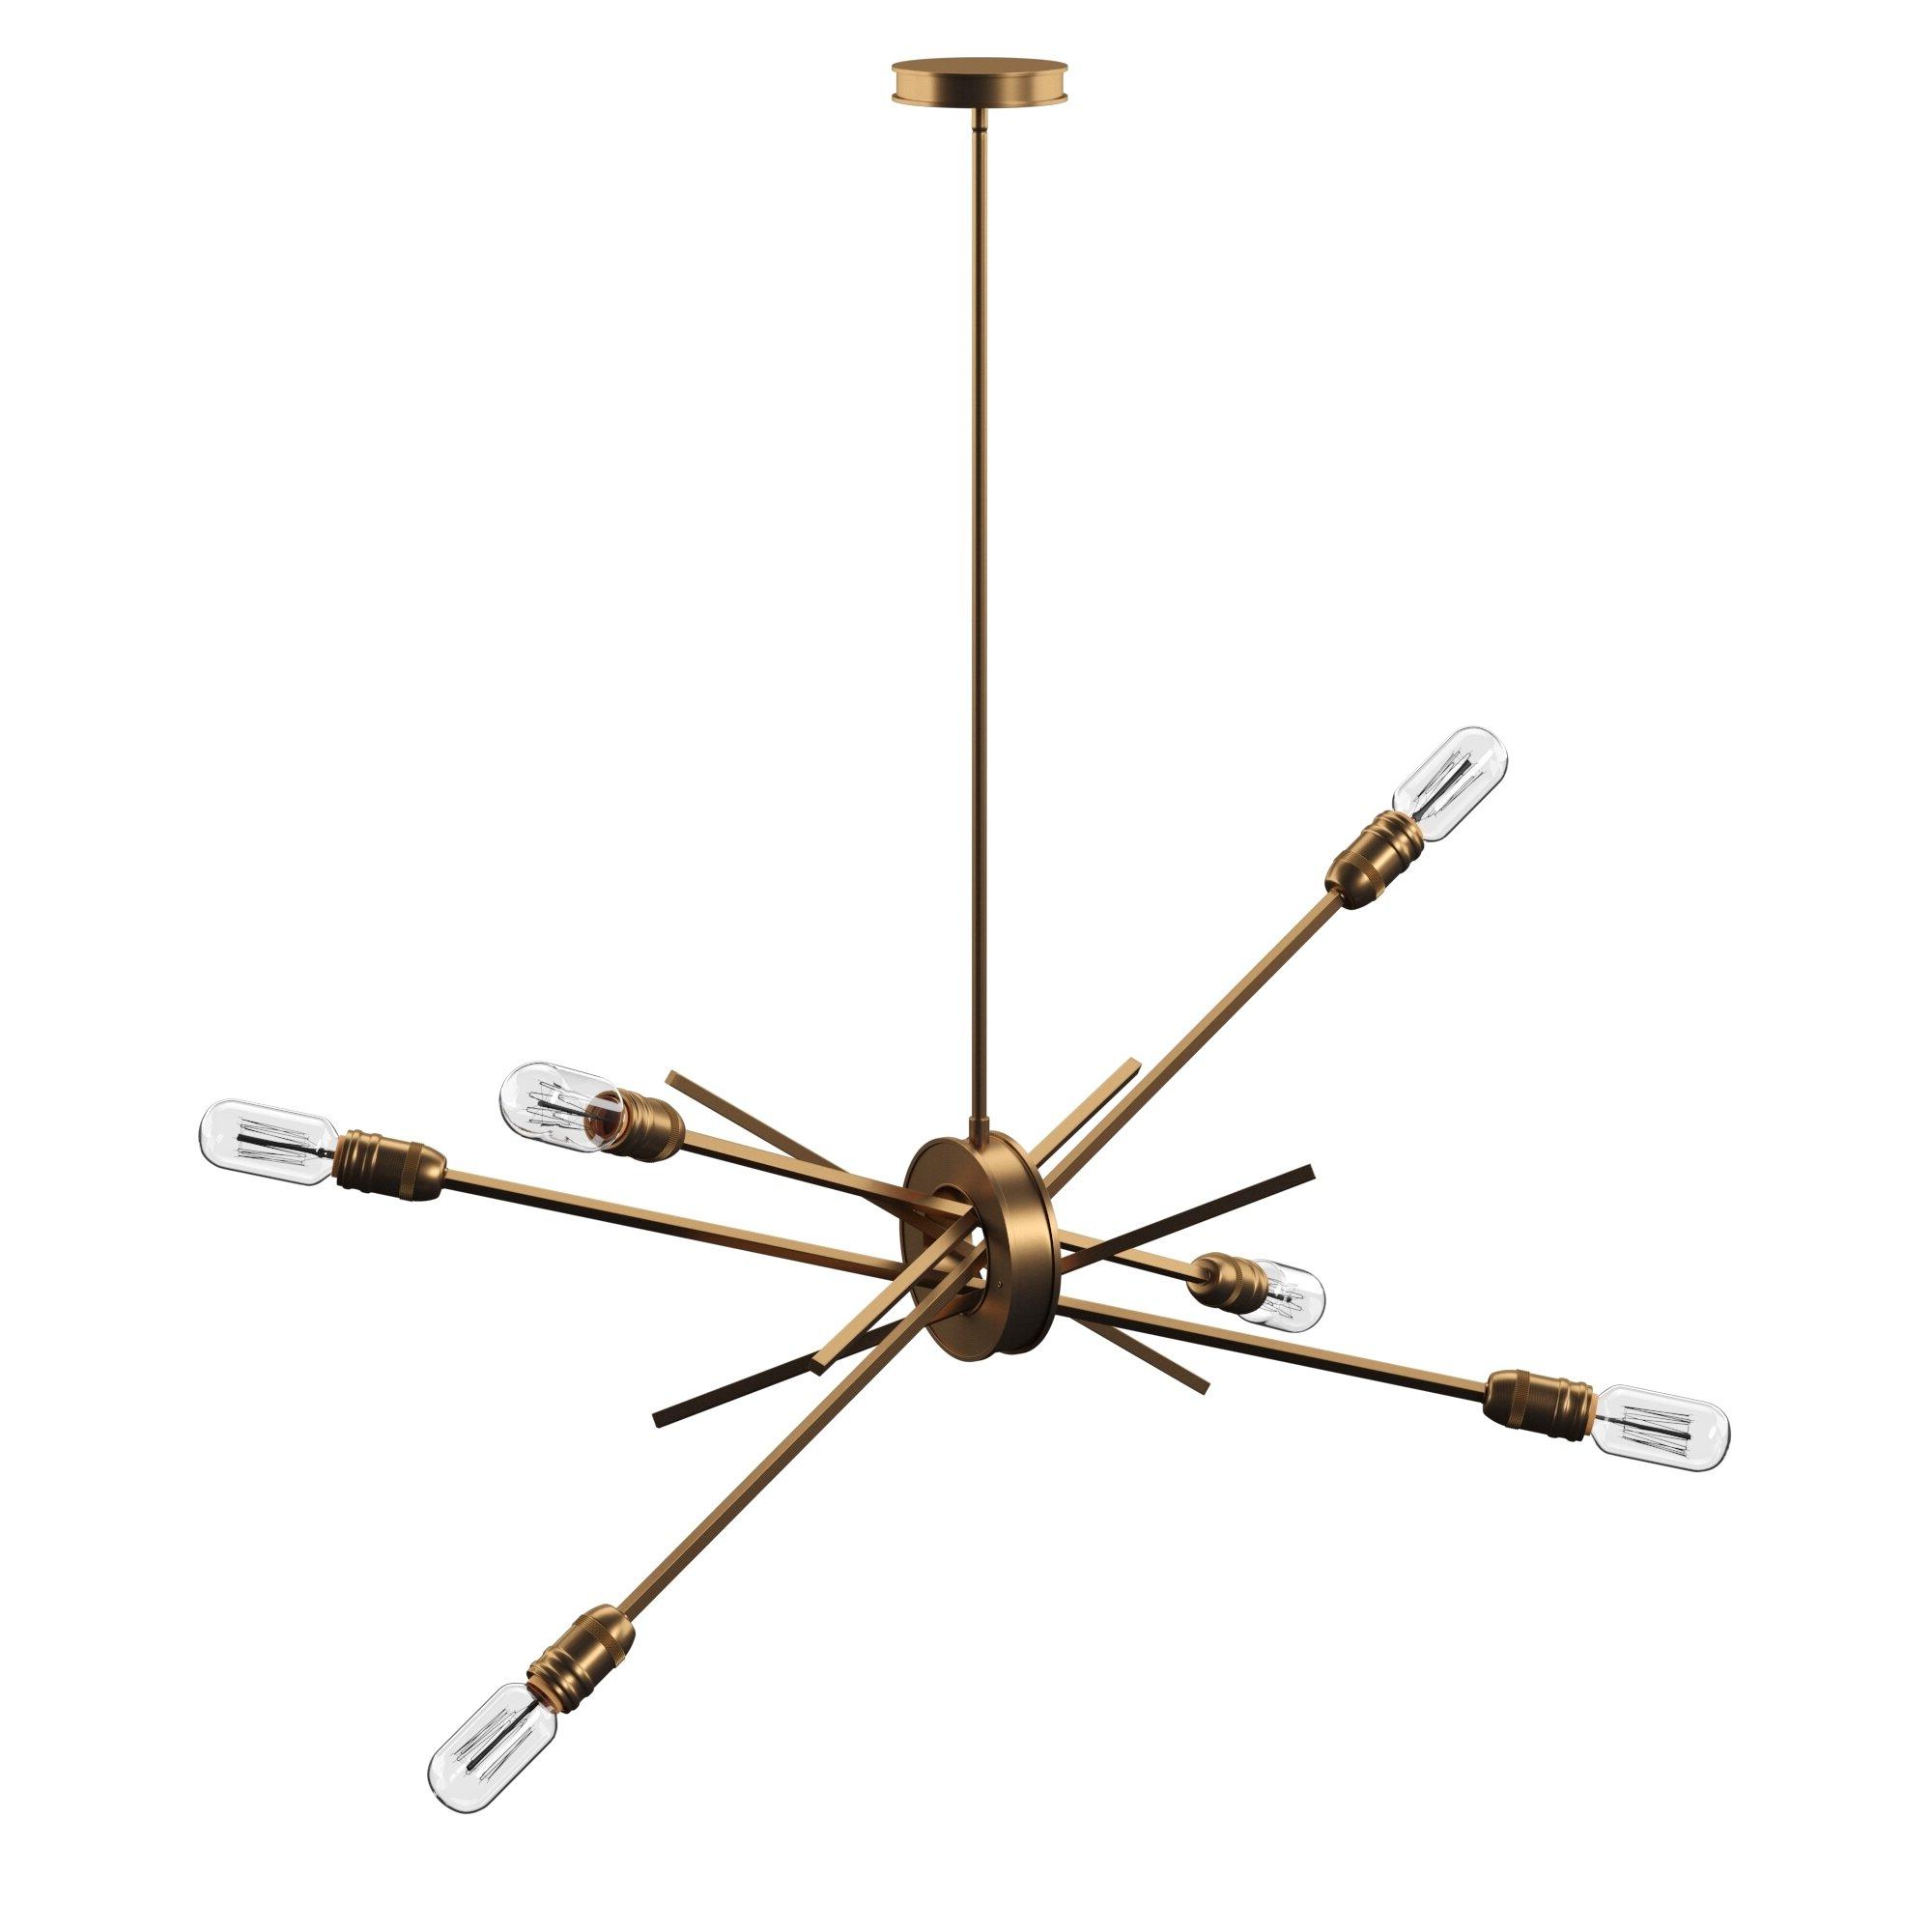 Everett 10 Light Sputnik Chandeliers Throughout Famous Byler 6 Light Sputnik Chandelier (Gallery 15 of 20)